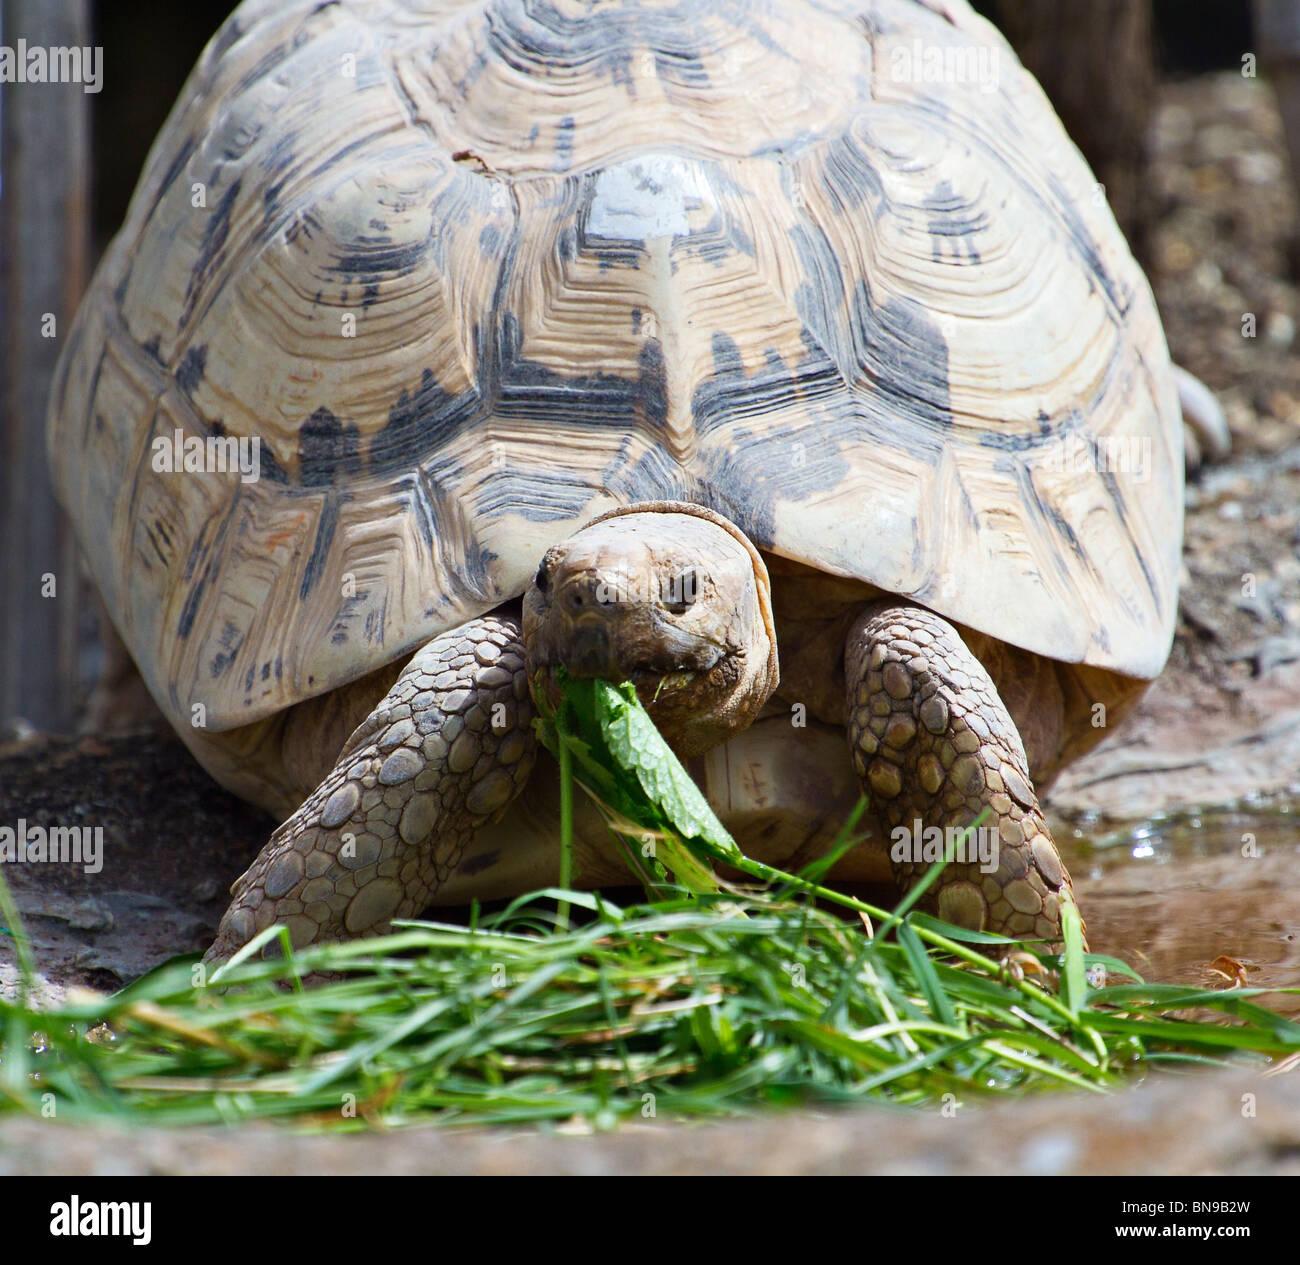 Eastern Leopard Tortoise eating leaf - Stock Image